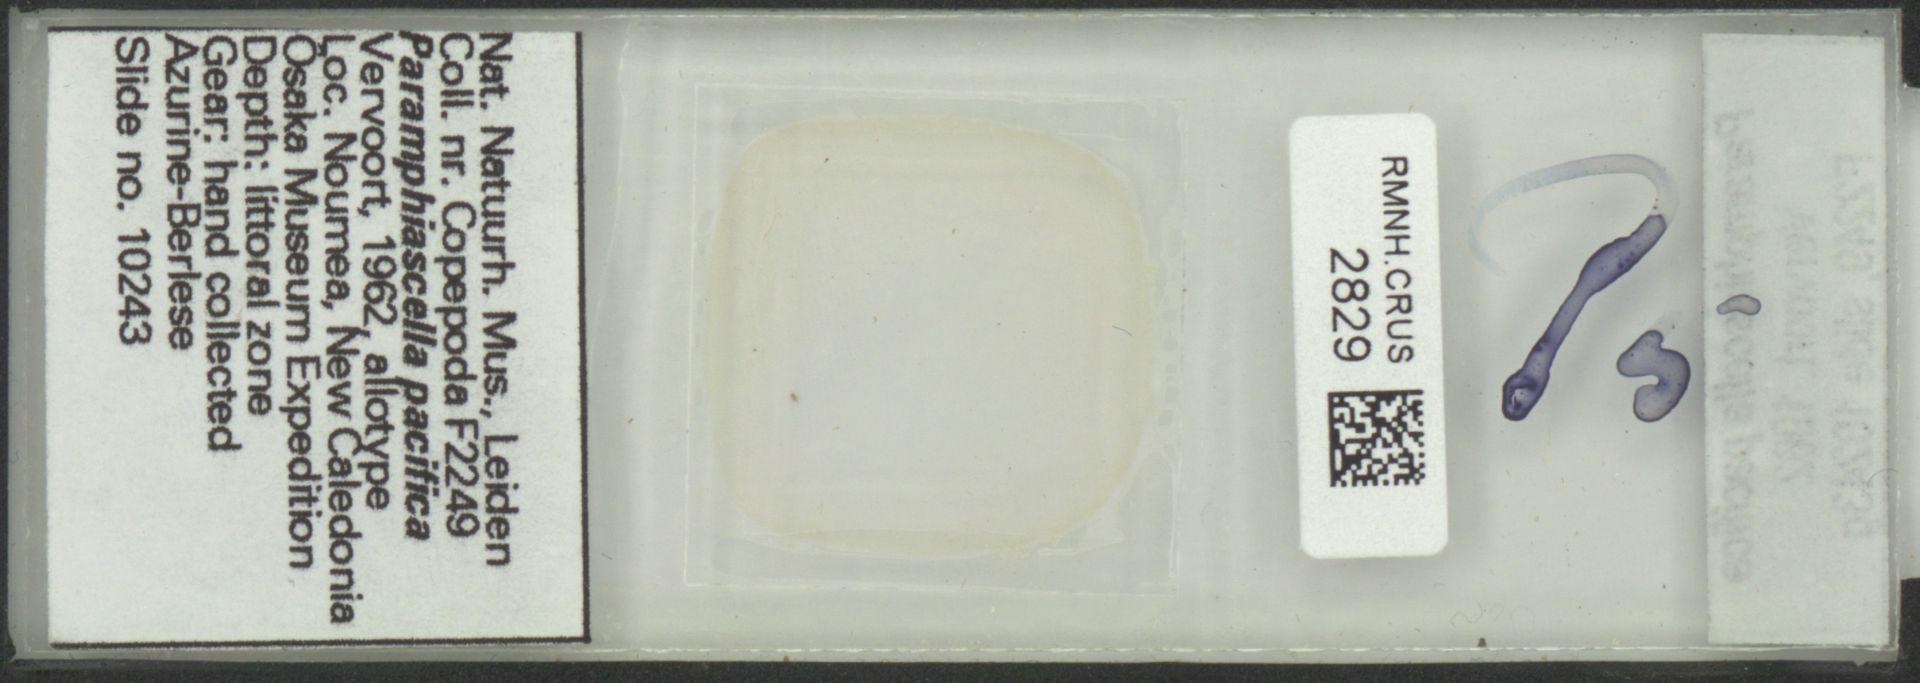 RMNH.CRUS.2829 | Paramphiascella pacifica Vervoort, 1962